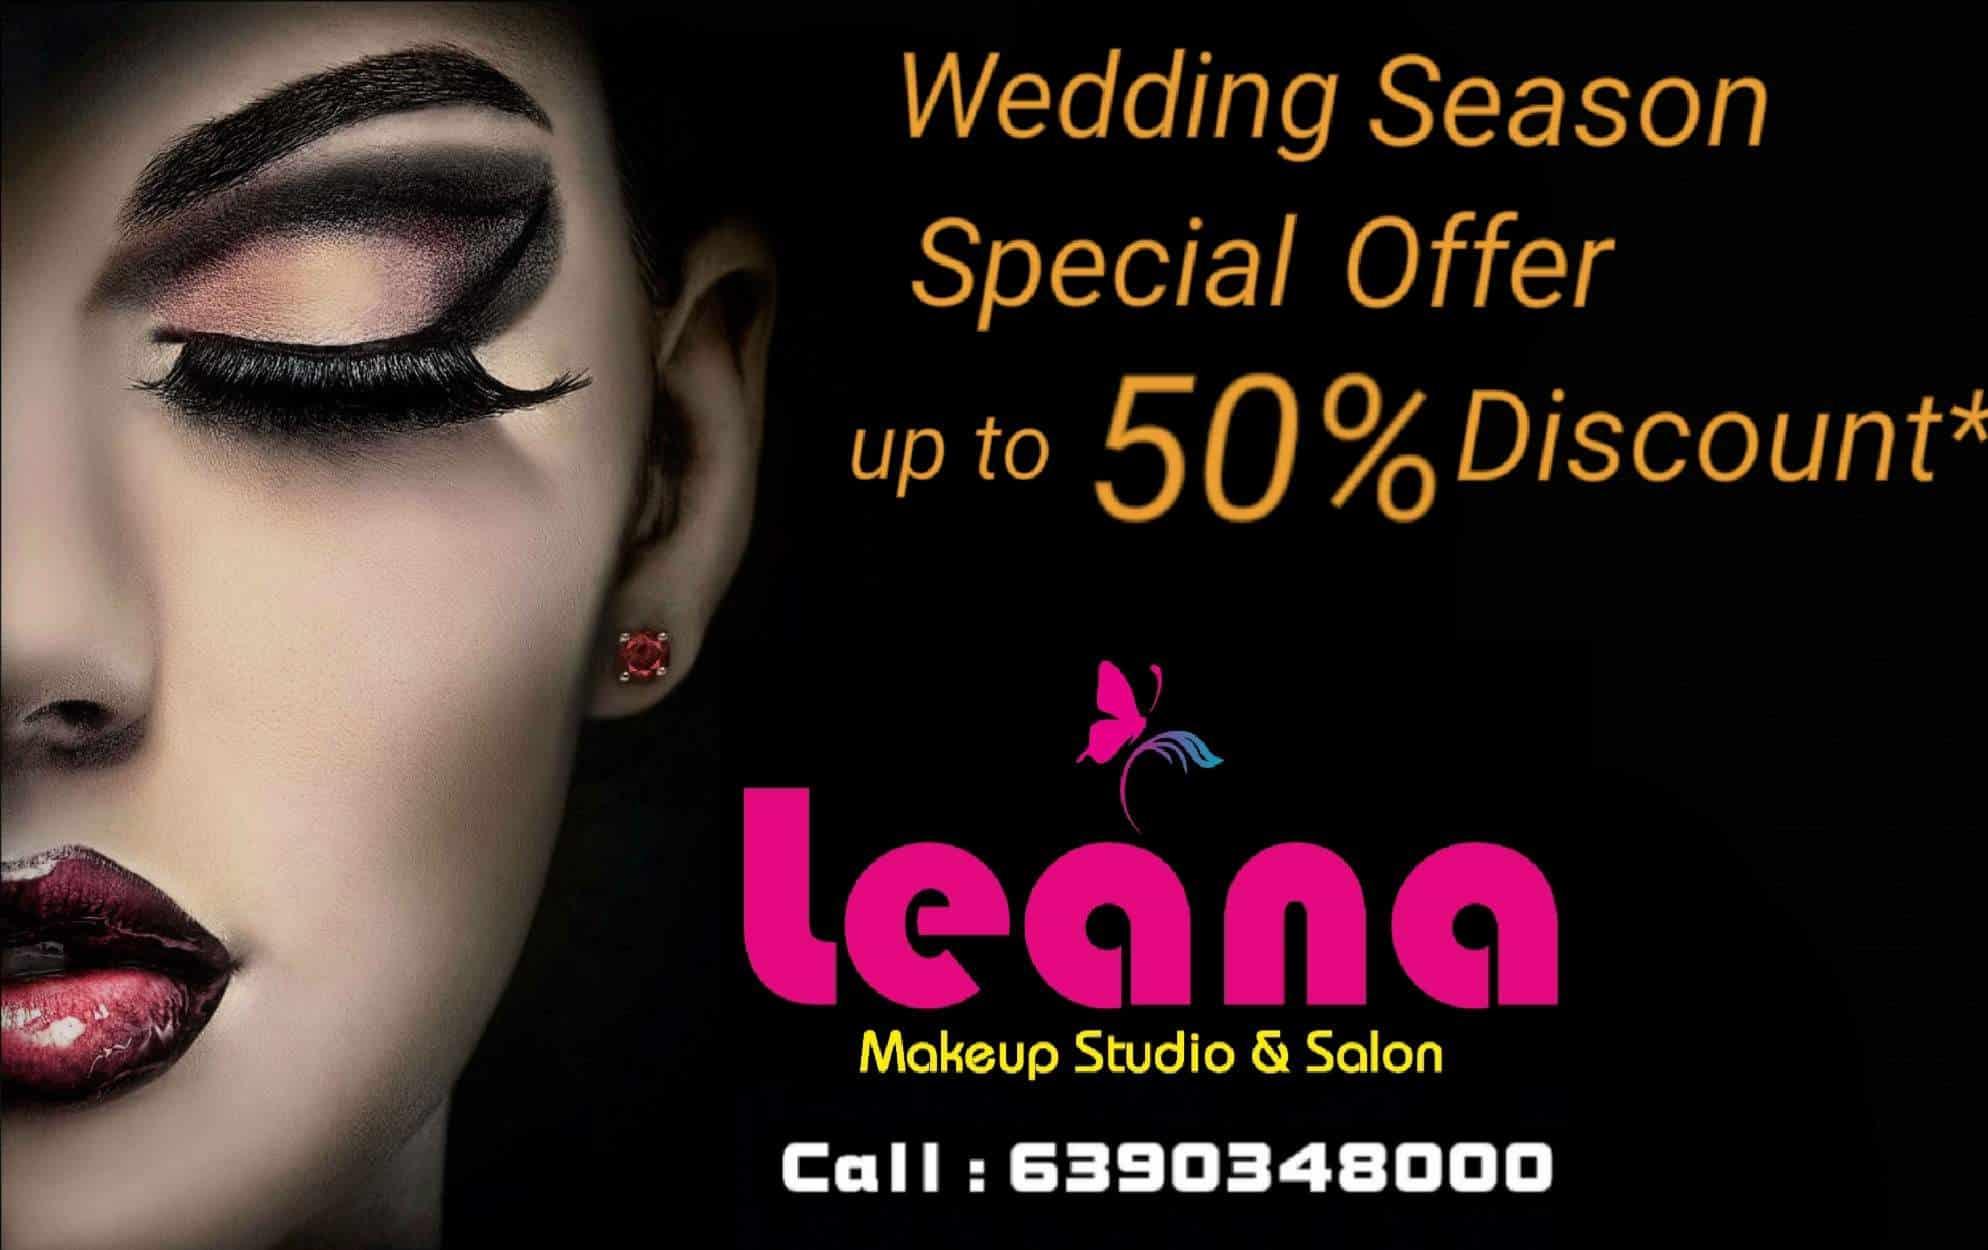 Leana Makeup Studio & Salon, Indira Nagar - Beauty Salons in Lucknow - Justdial